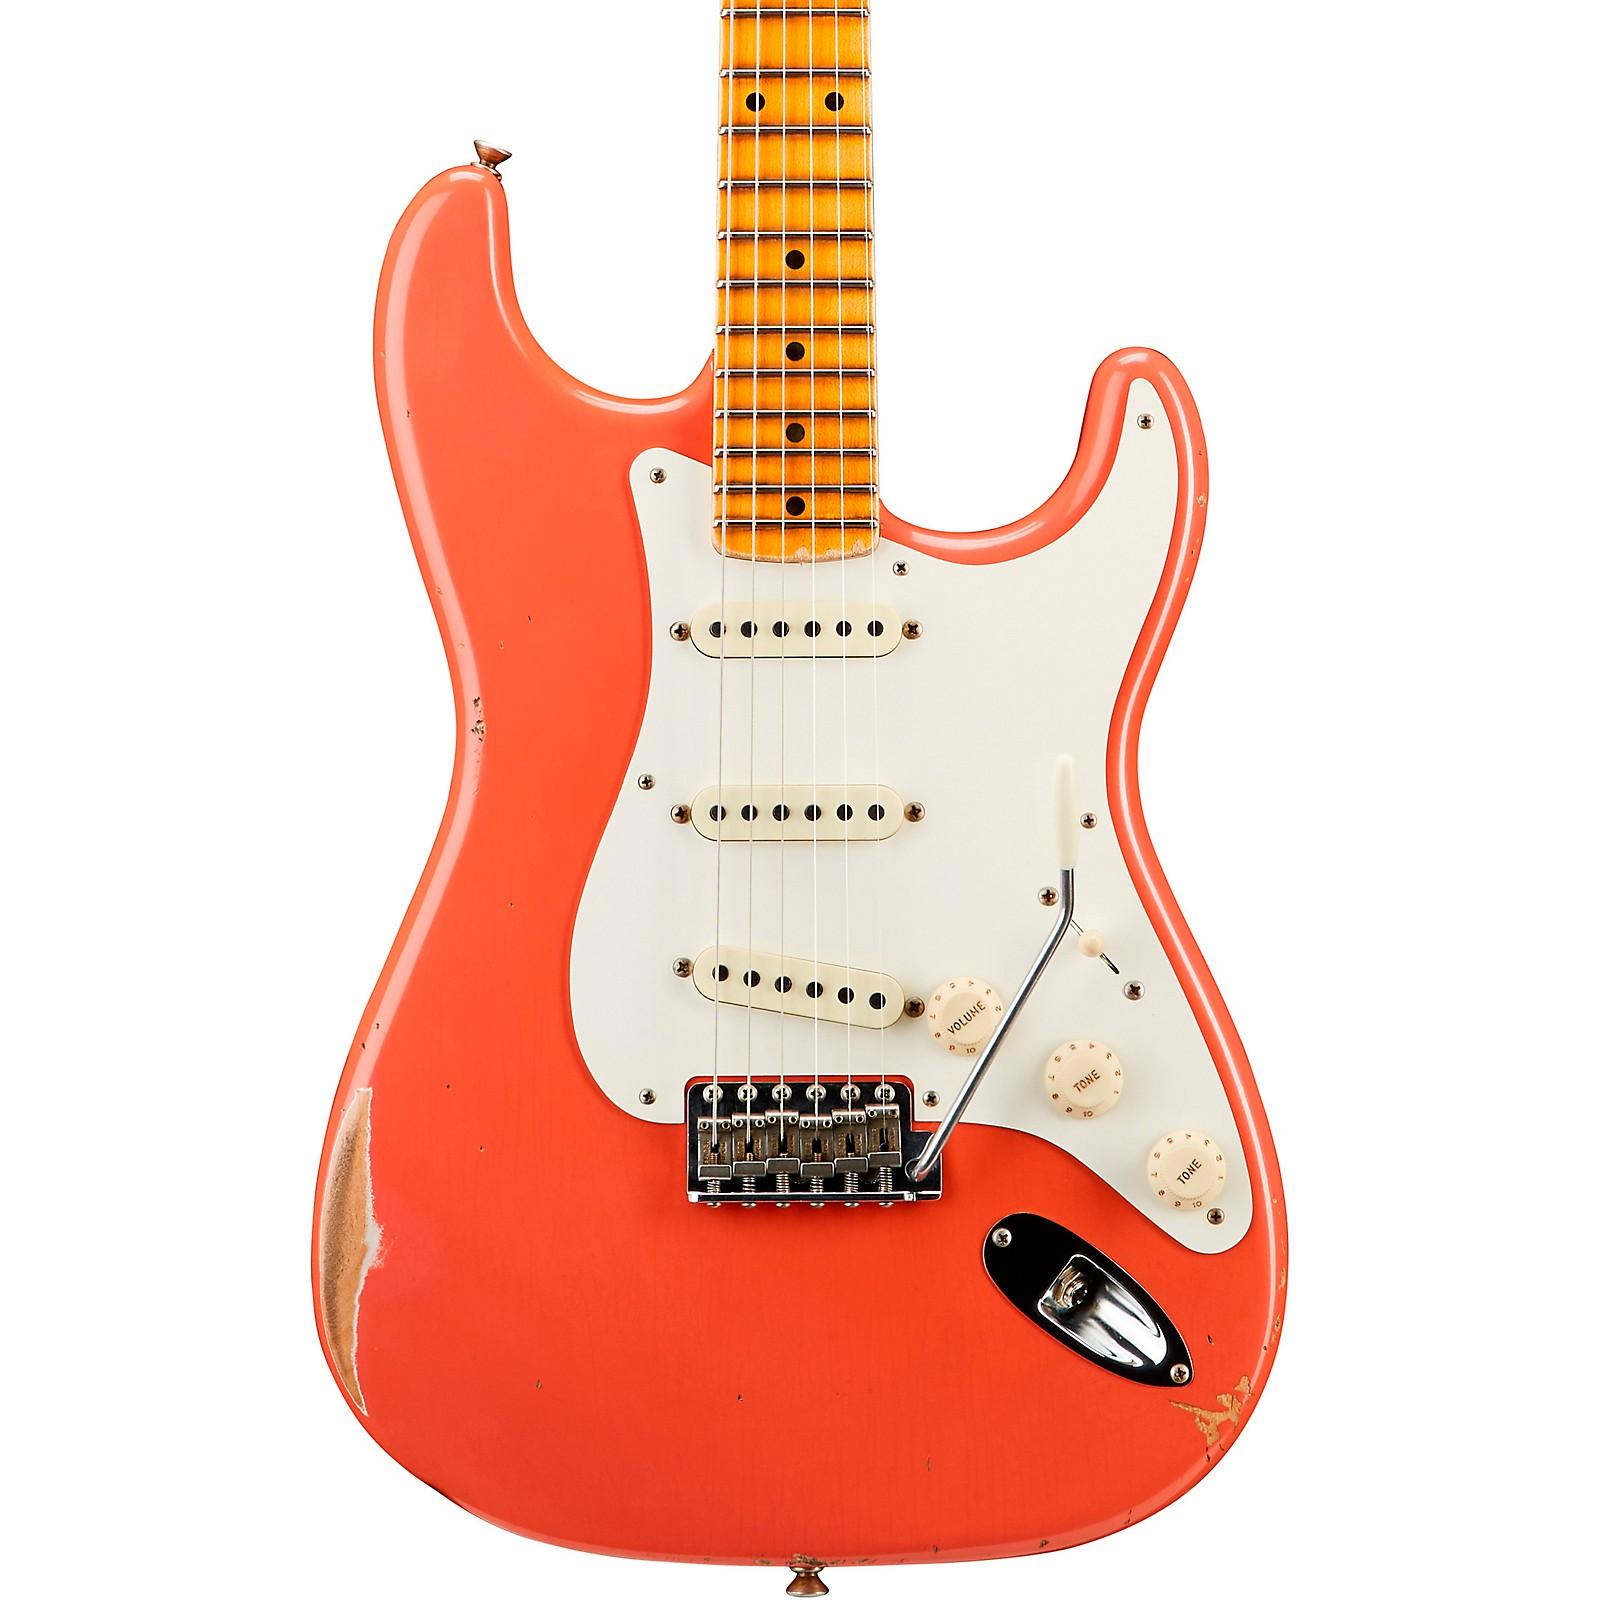 Fender Custom Shop 1958 Relic Stratocaster Electric Guitar